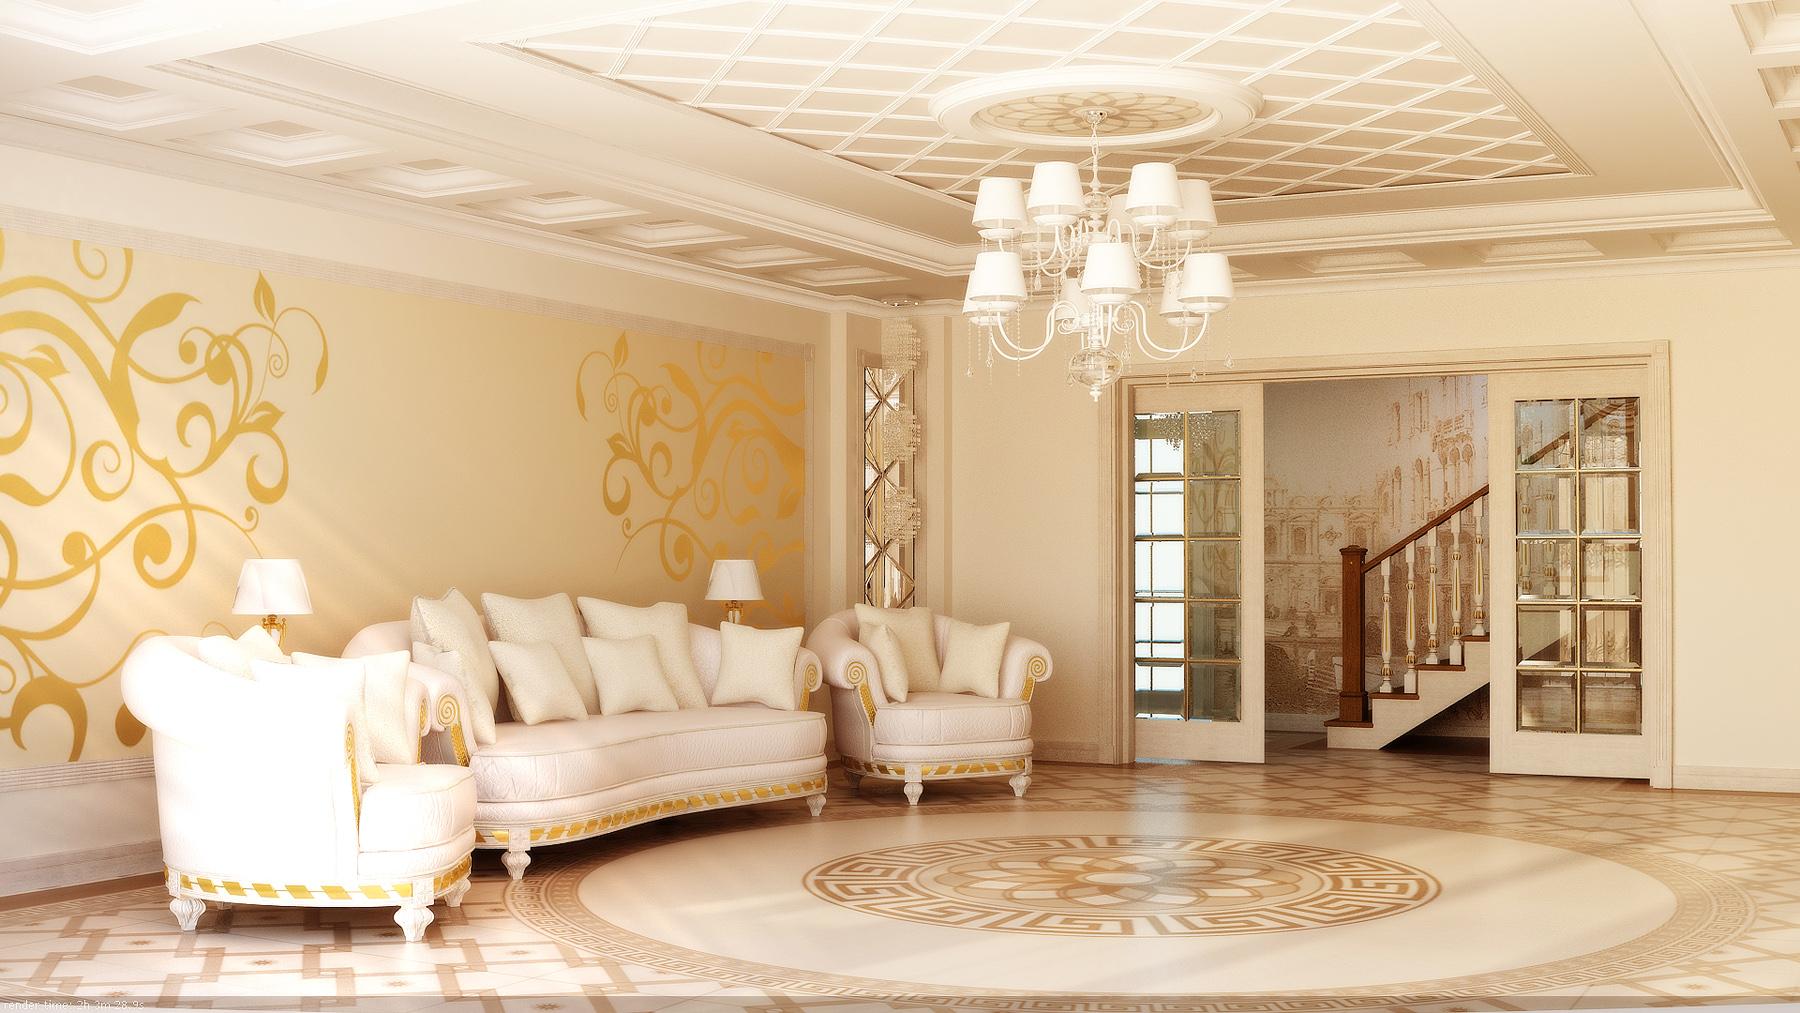 Идеи обоев для зала в доме фото